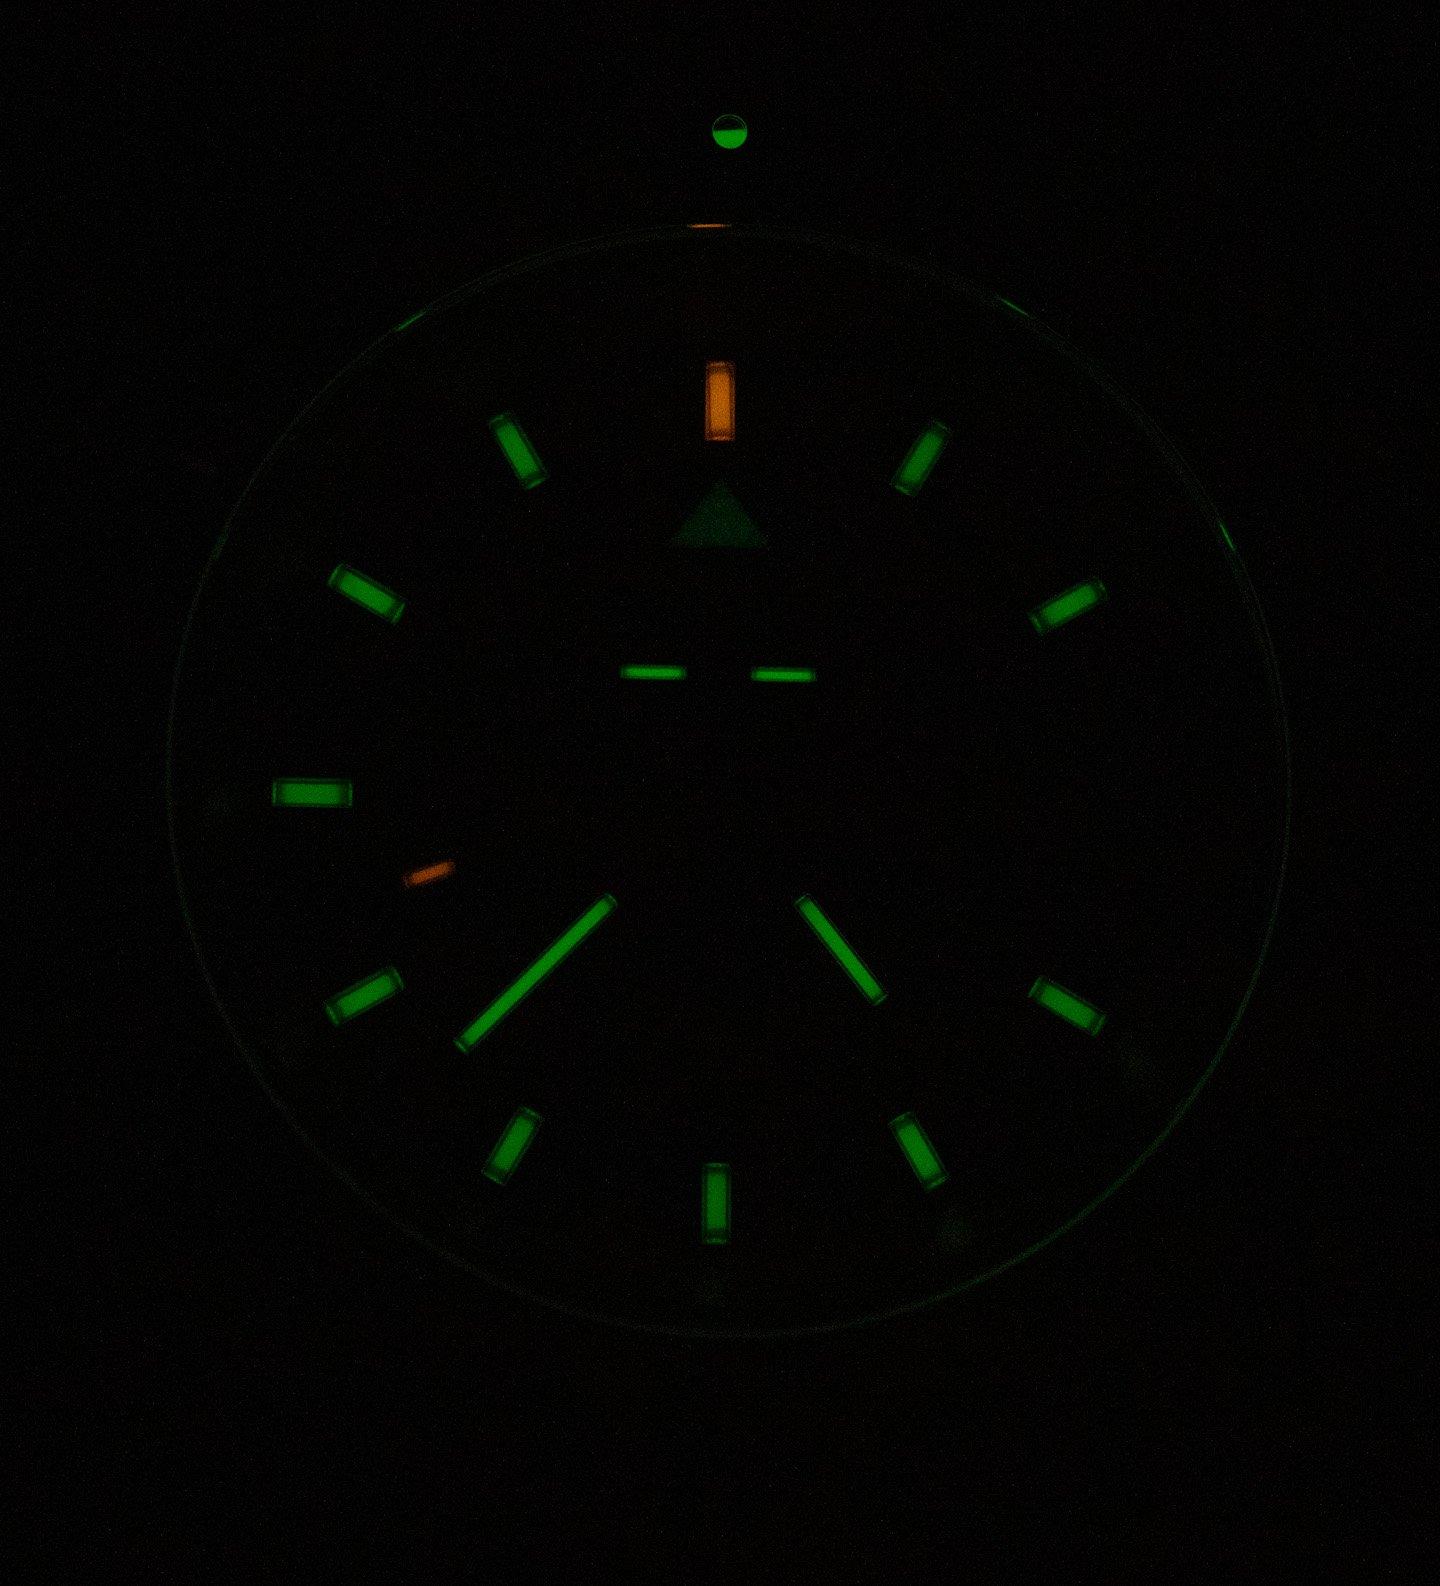 Обзор часов: Traser P69 Black Stealth